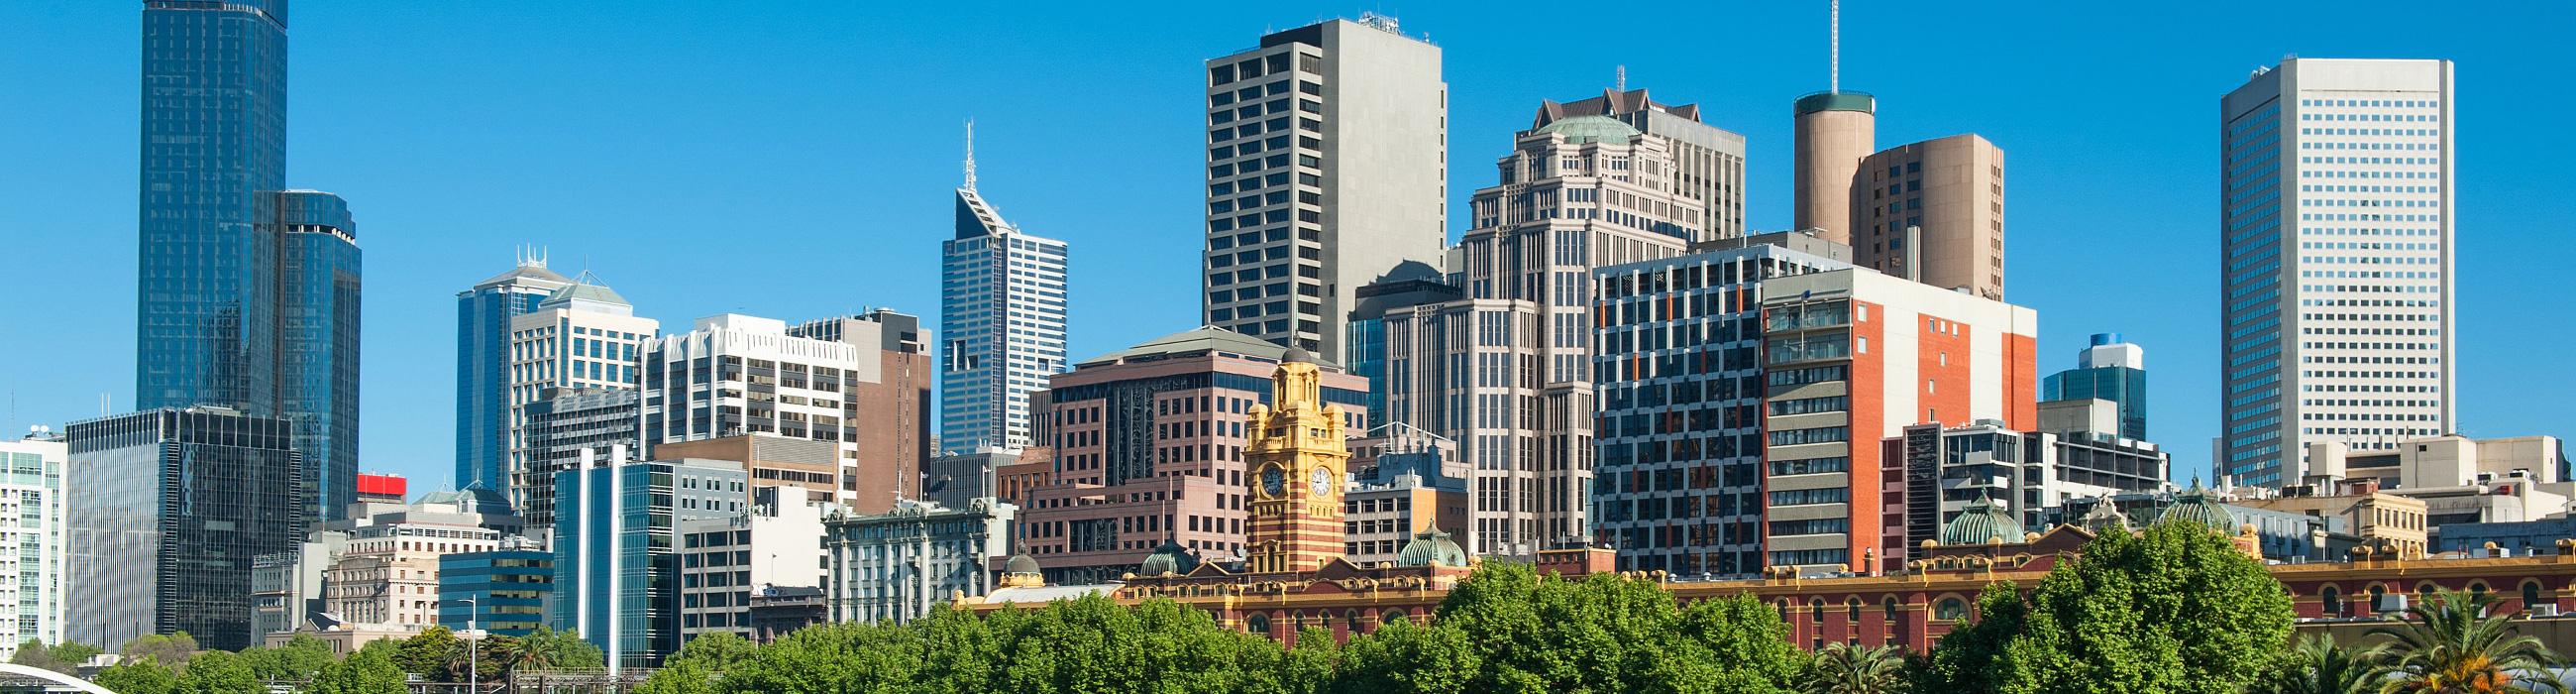 Melbourne's Skilled Advisor and Negotiator